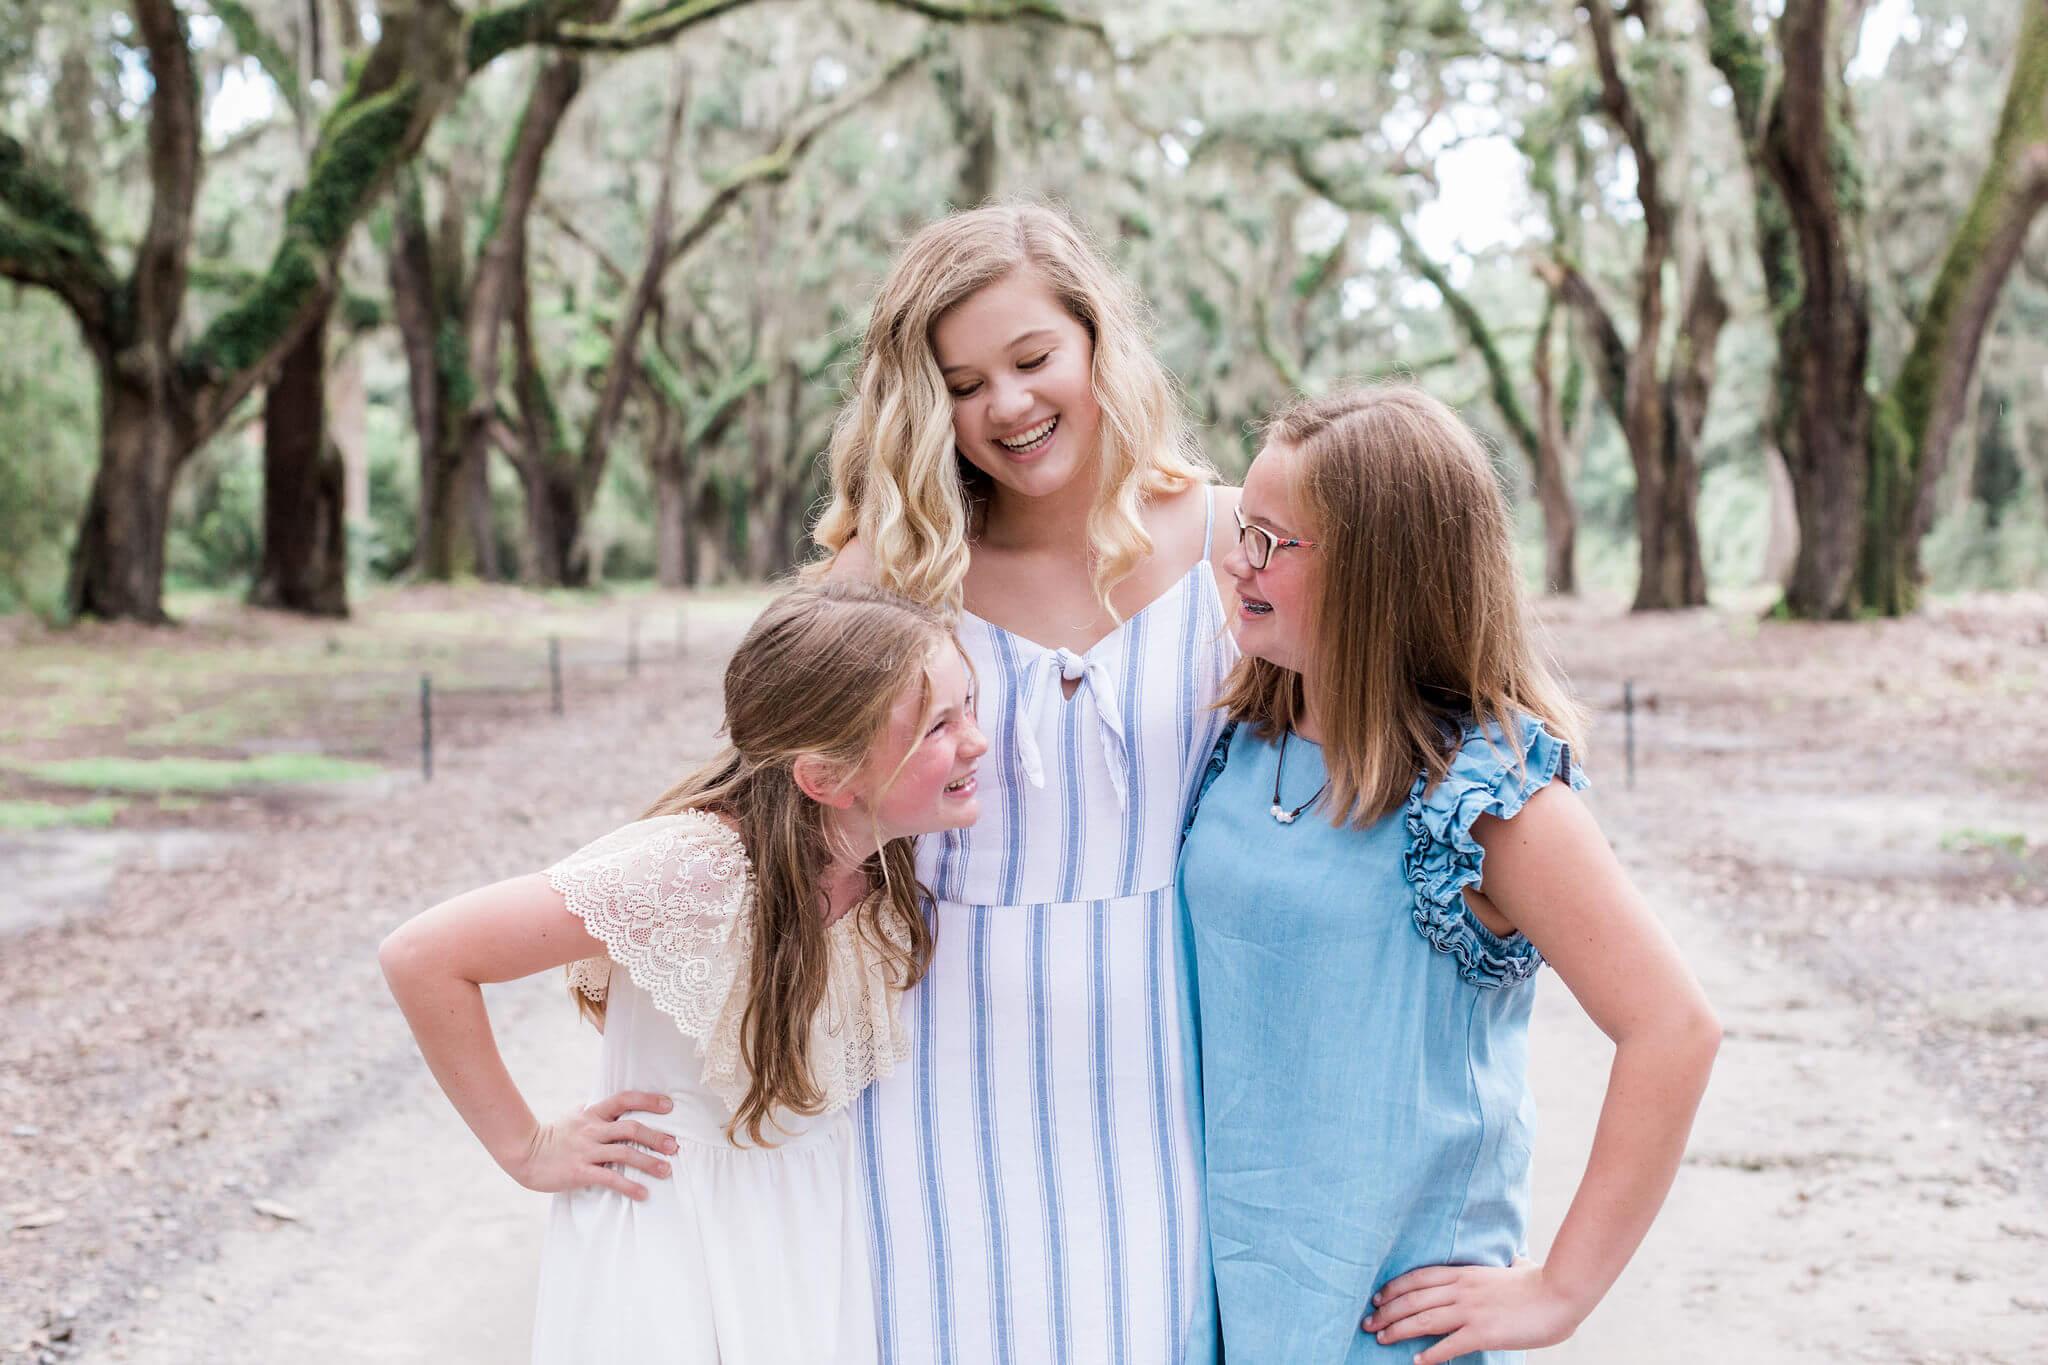 Apt-b-photography-savannah-engagement-photographer-savannah-family-kid-hilton-head-elopement-savannah-wedding-photographer-7.jpg